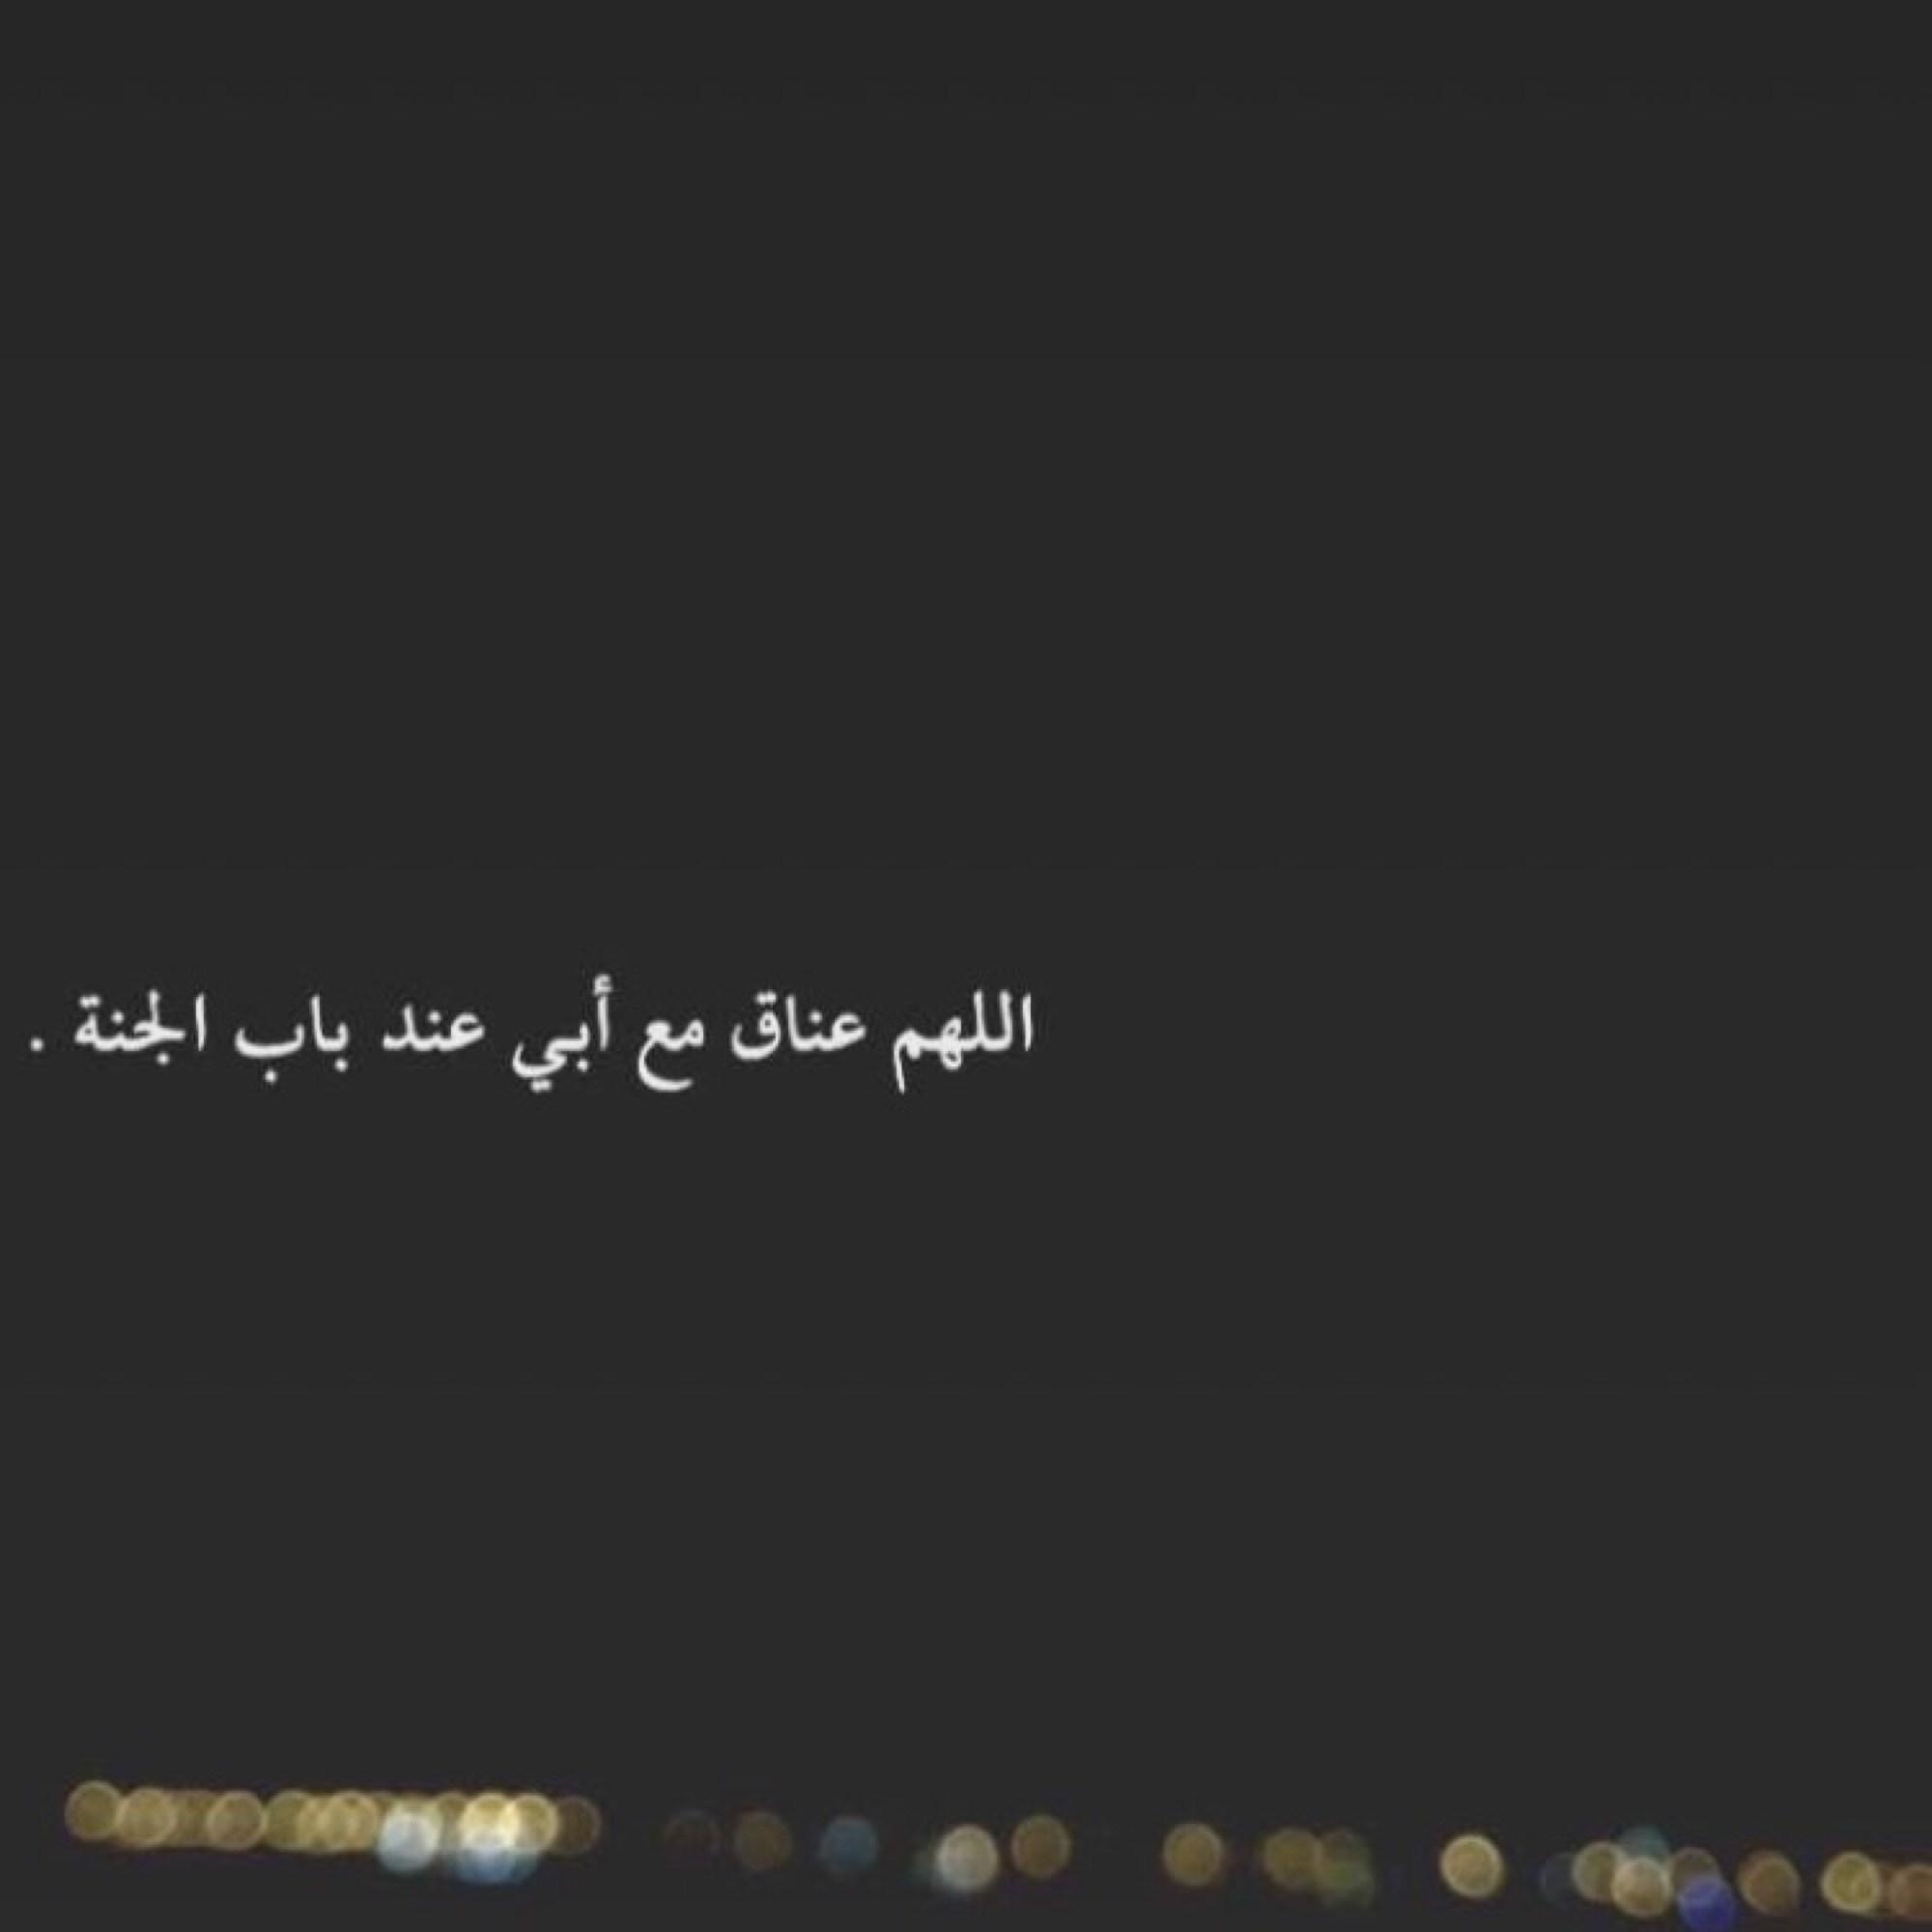 nod_alali's Cover Photo